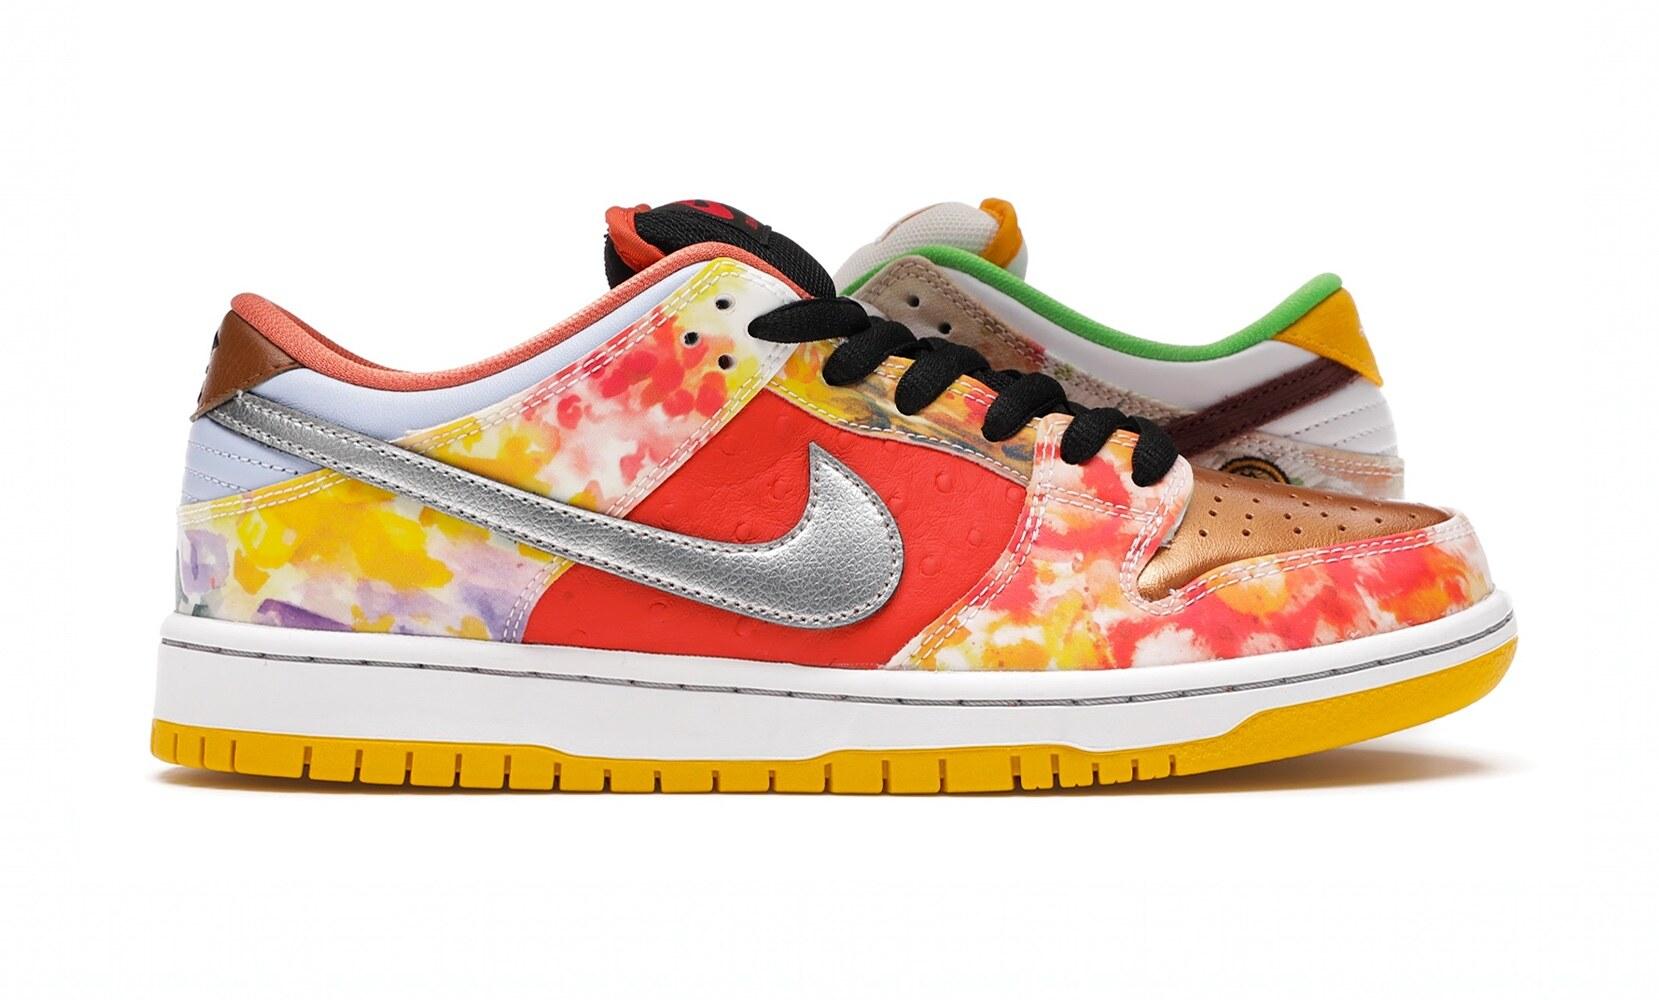 Nike SB Dunk Low Street Hawker